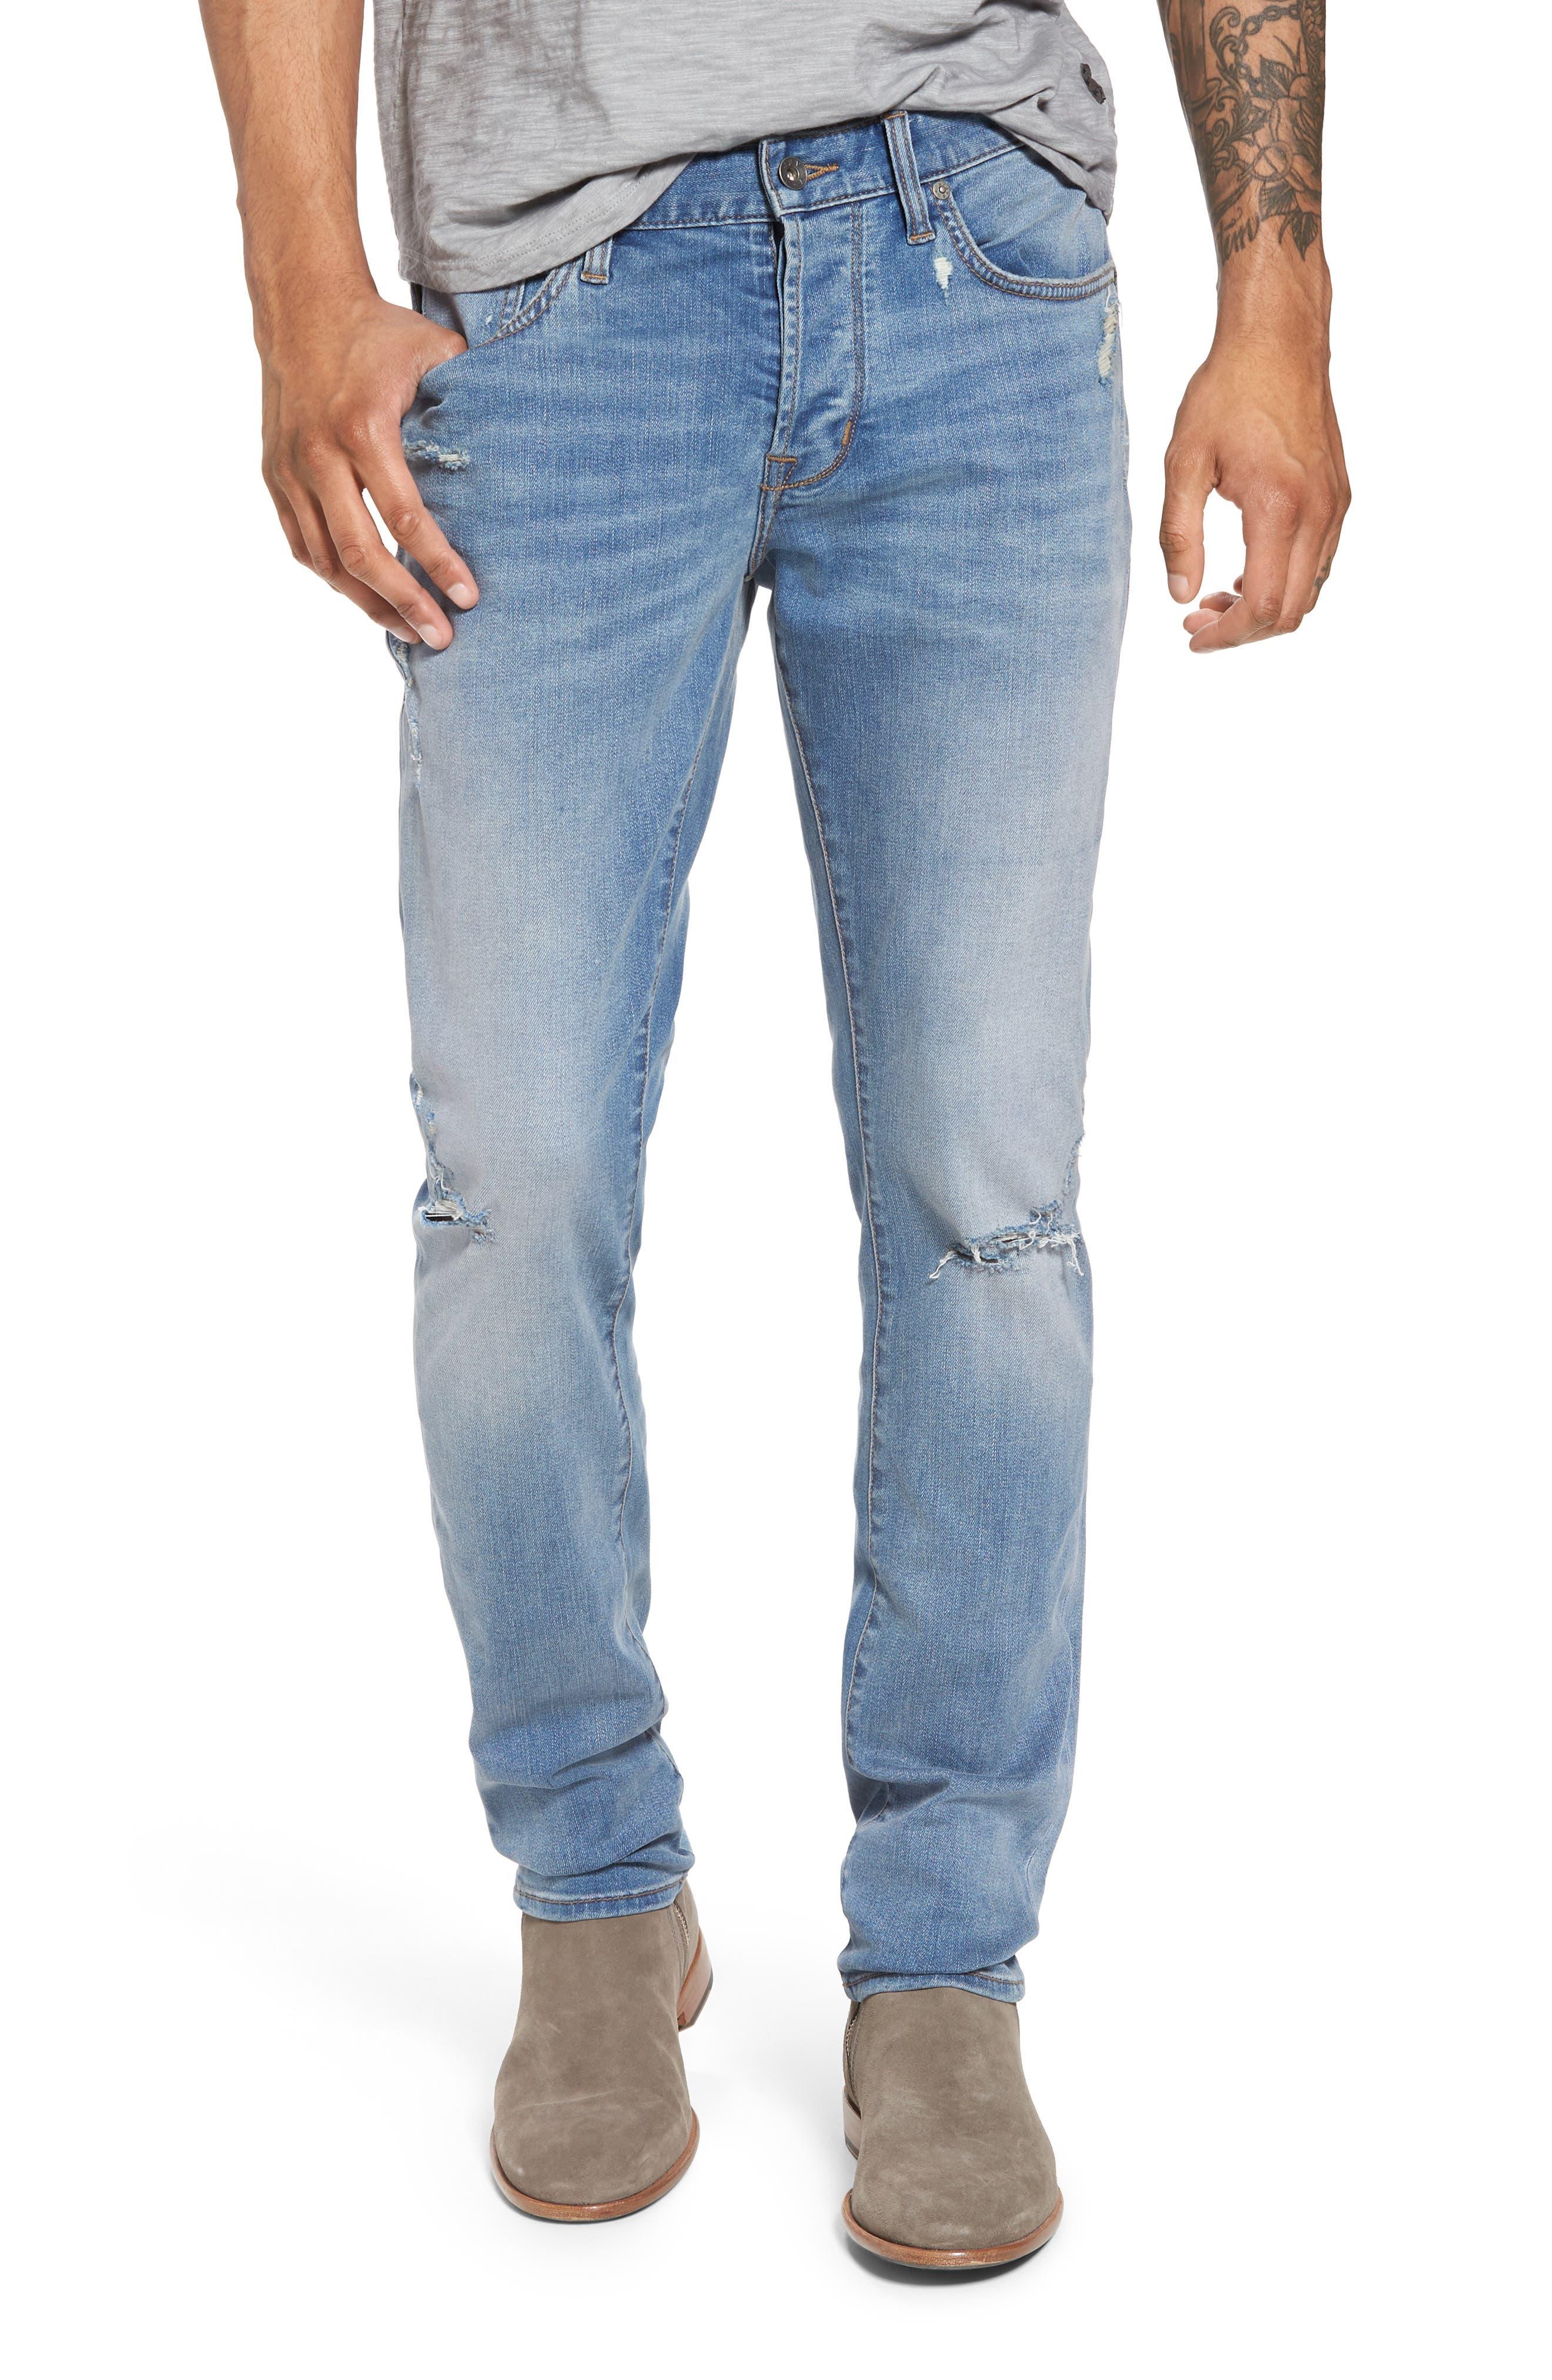 Wight Slim Fit Straight Leg Jeans,                         Main,                         color, Atlantic Blue